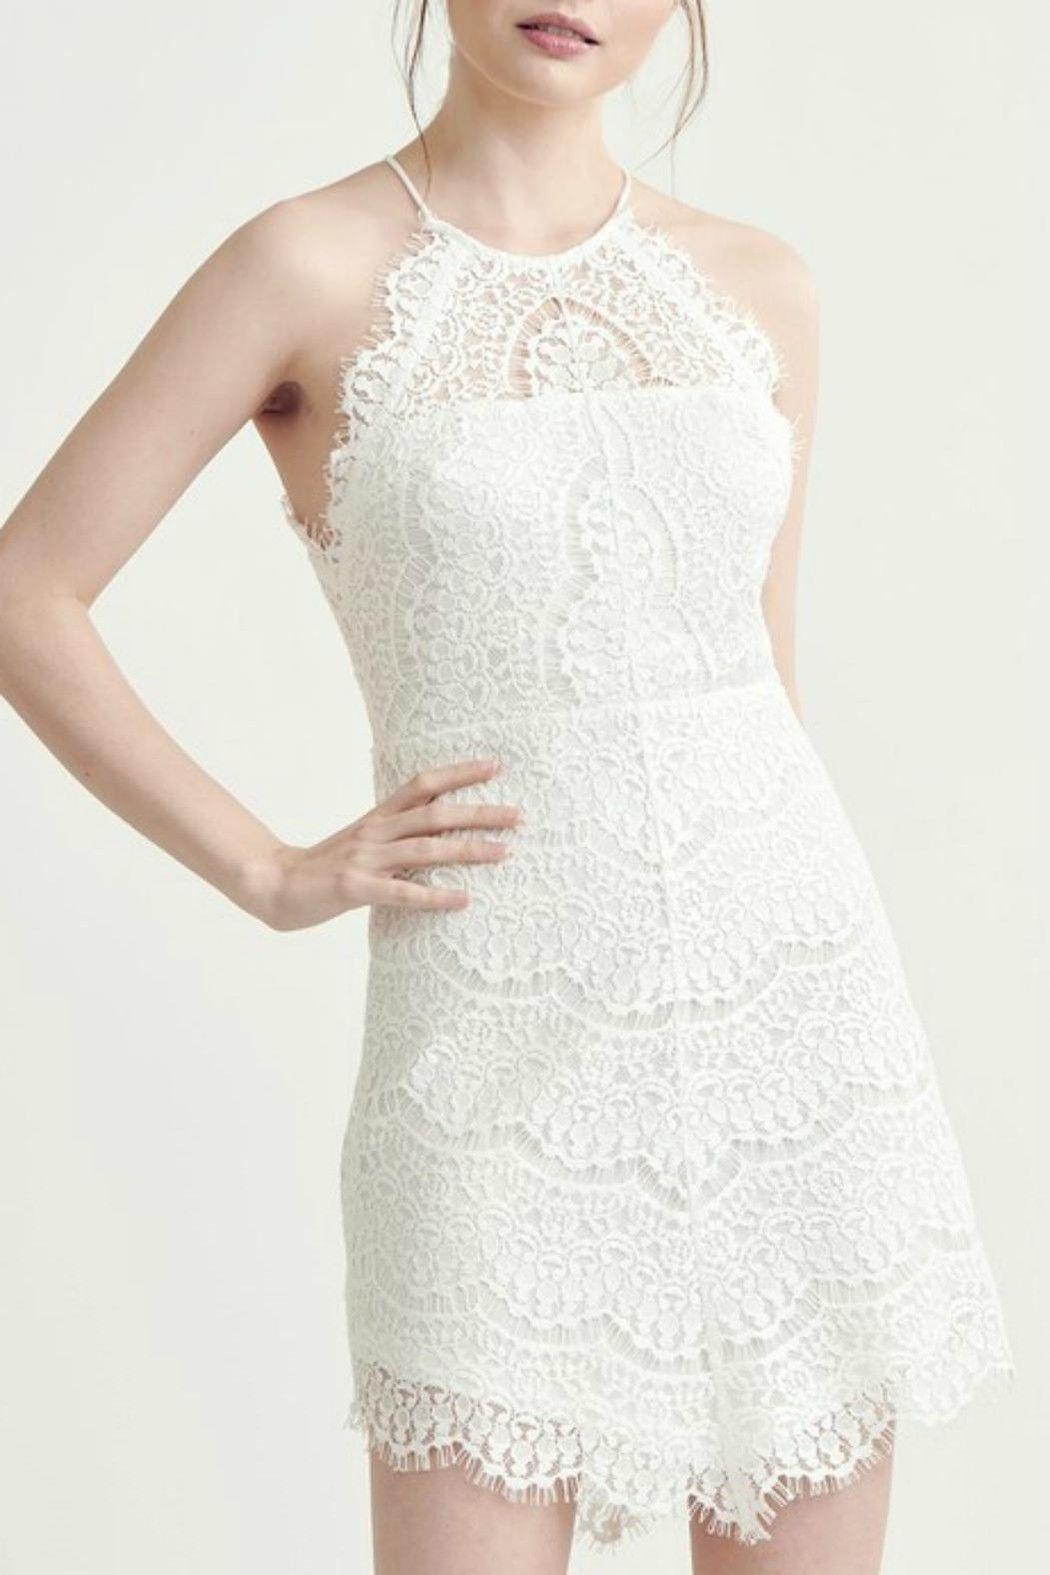 40 Prettiest Rehearsal Dinner Short Wedding Dresses - Page